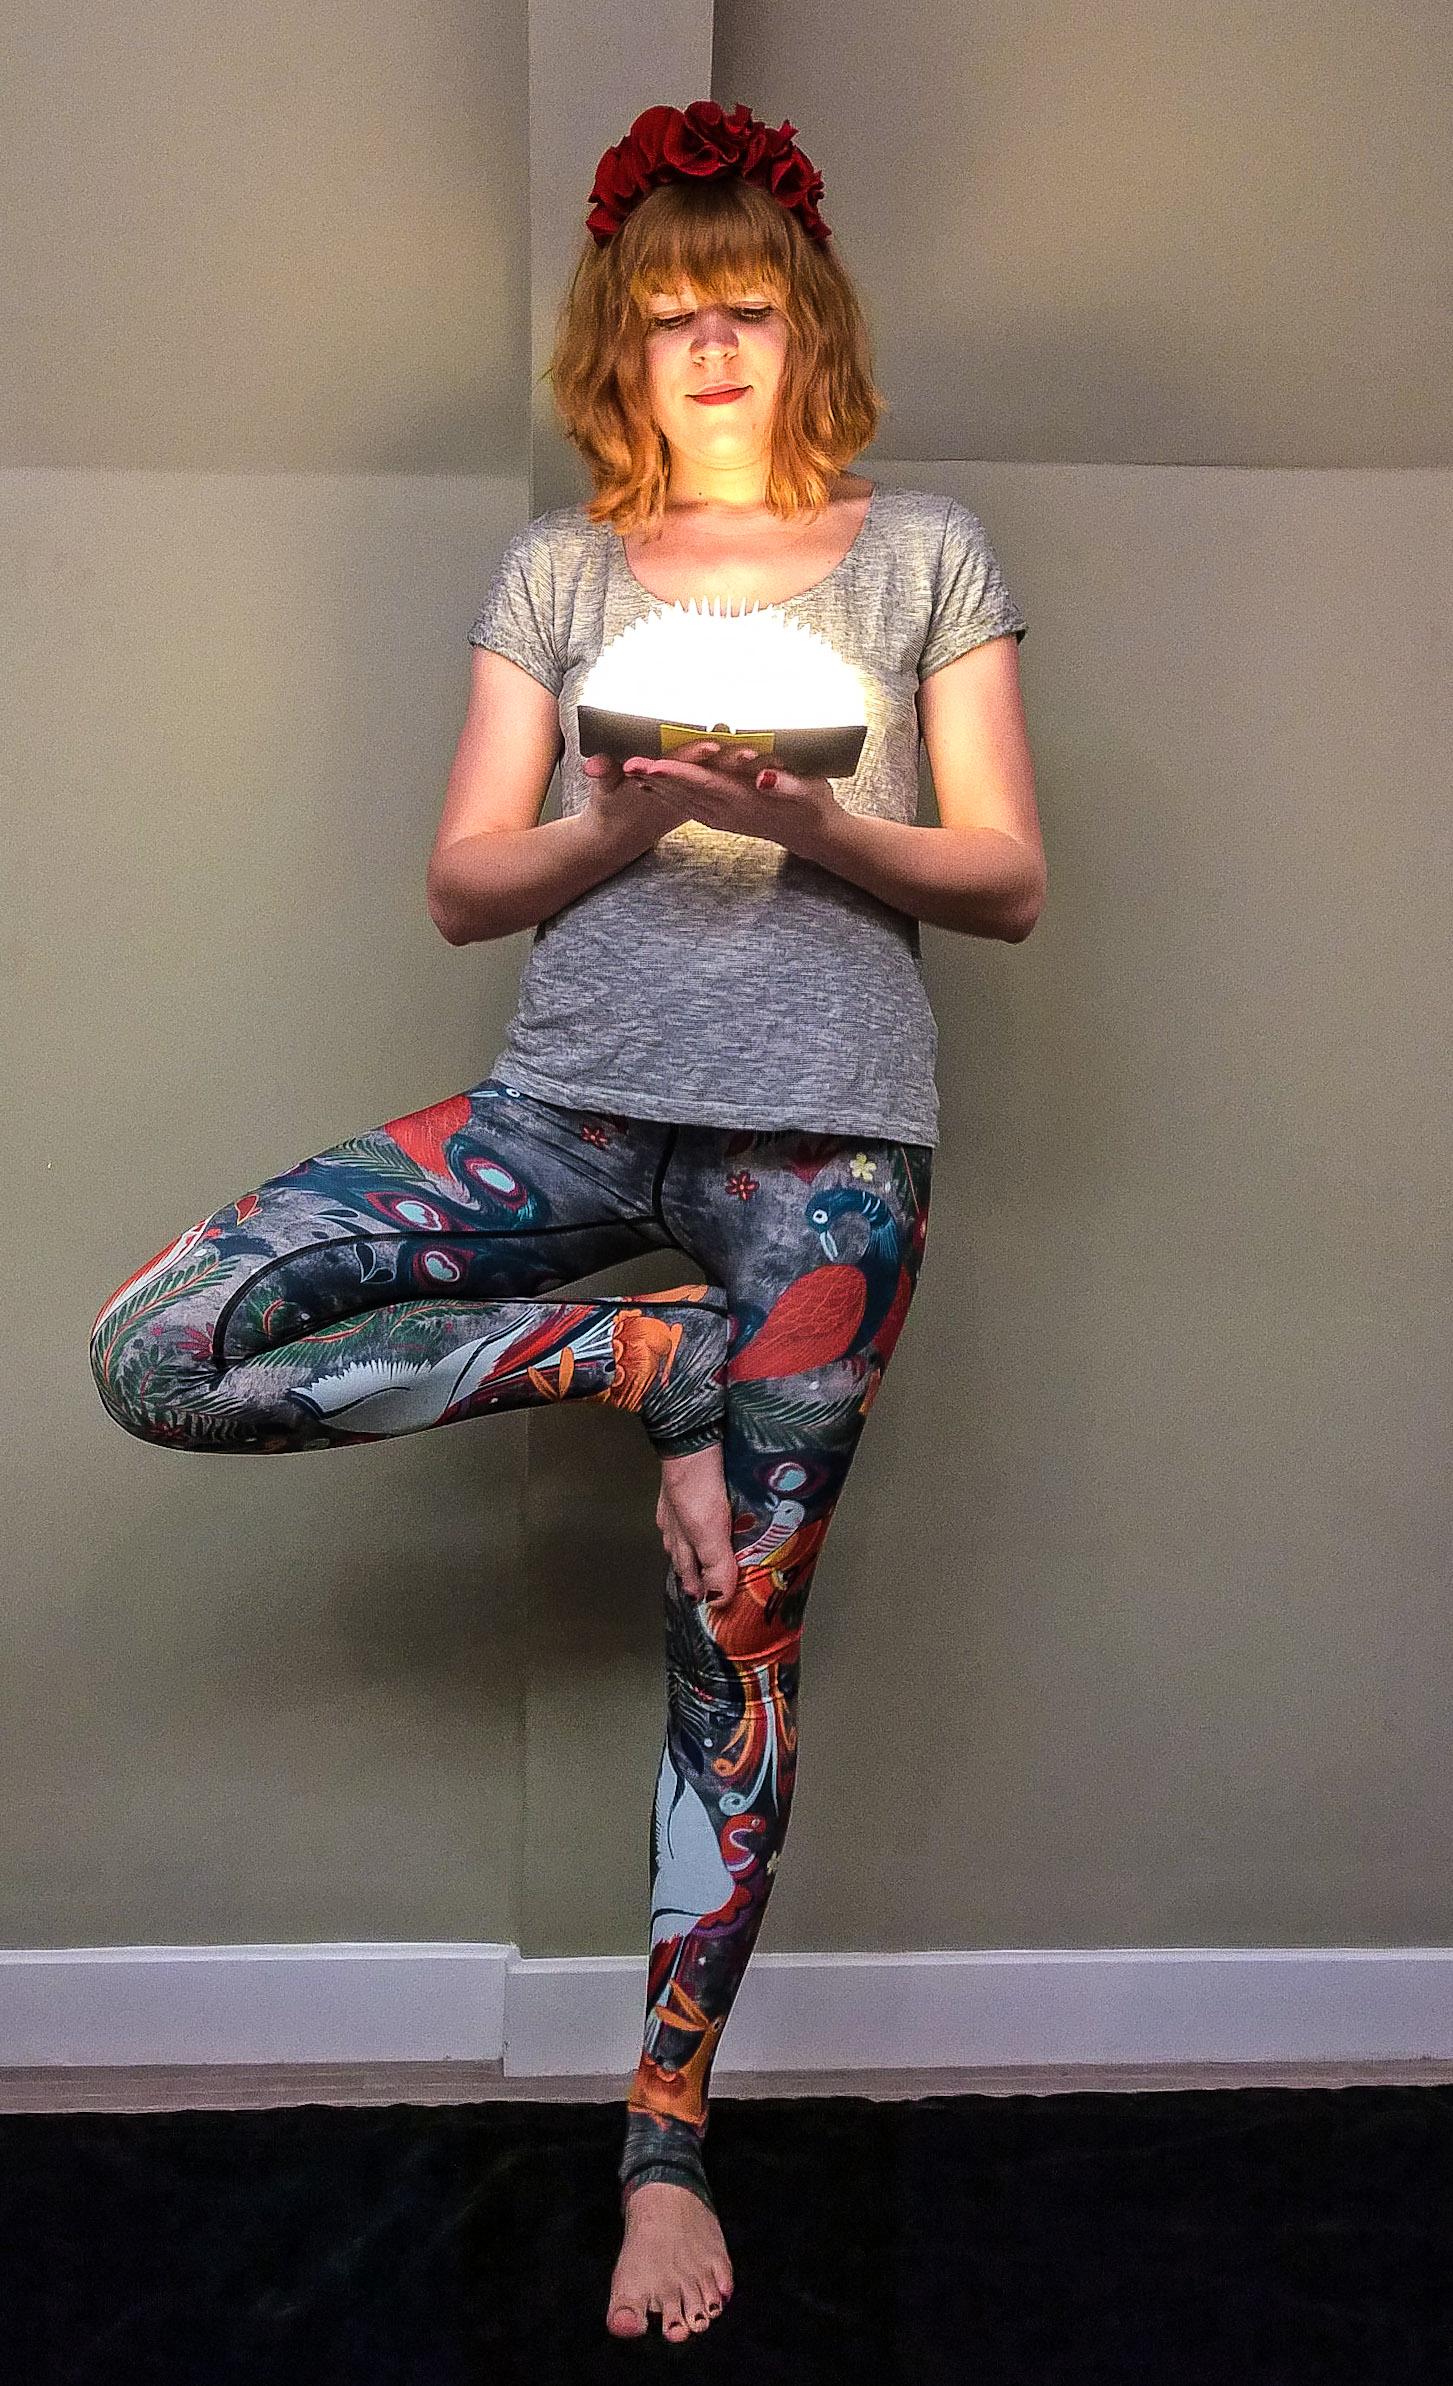 bonnes résolutions hatha yoga democracy tree pose ethical activewear